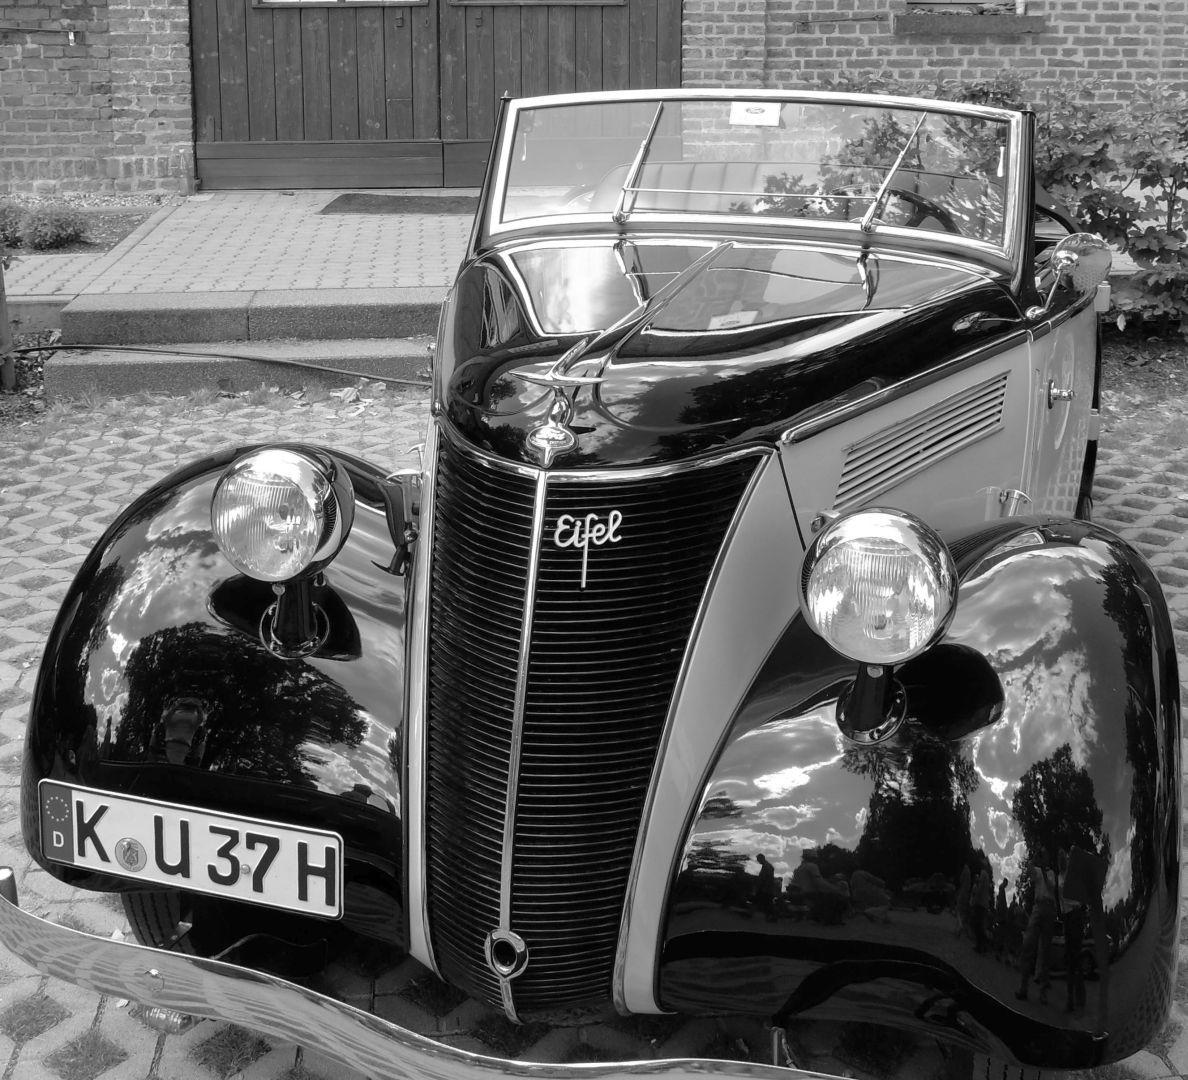 Ford_Eifel_Schloss_Dyck_2013_Galerie